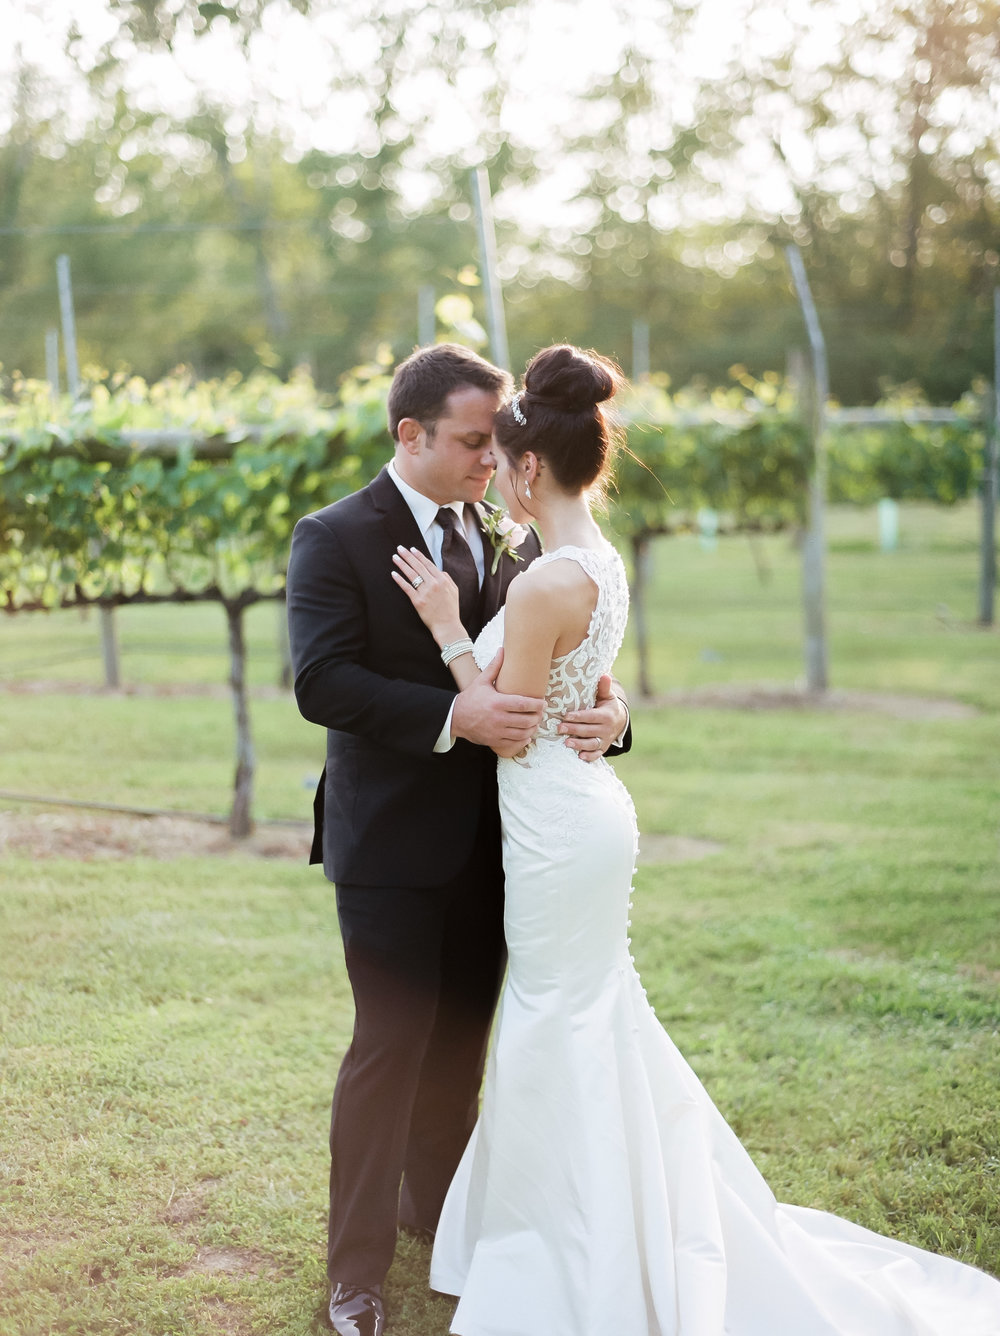 MagdalenaStudios_WeddingPhotographer_WillowCreekWinery_CarissaJoe-462.jpg